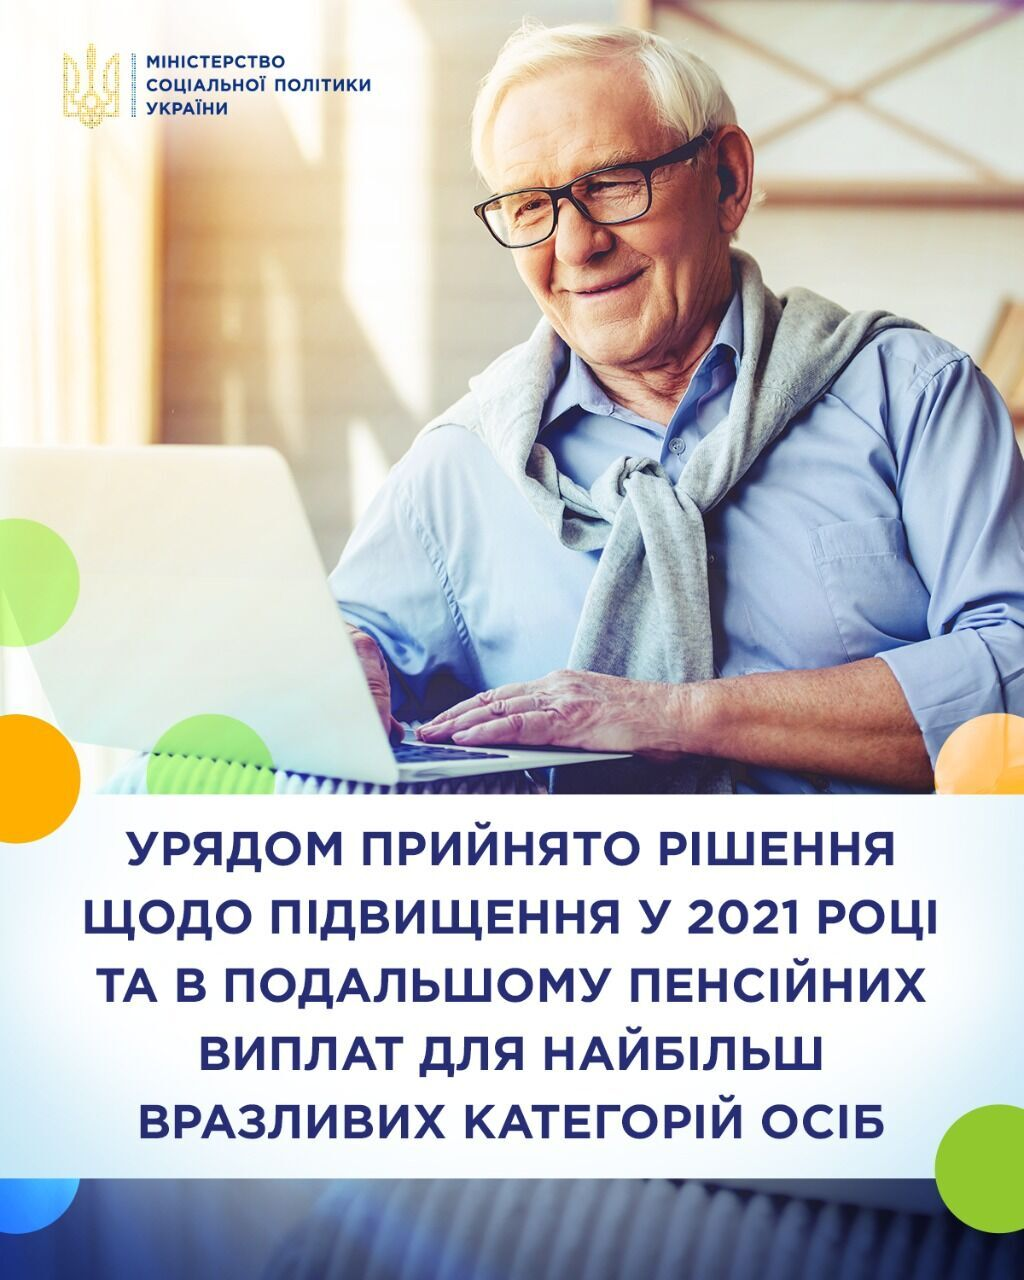 Пенсии в Украине увеличат